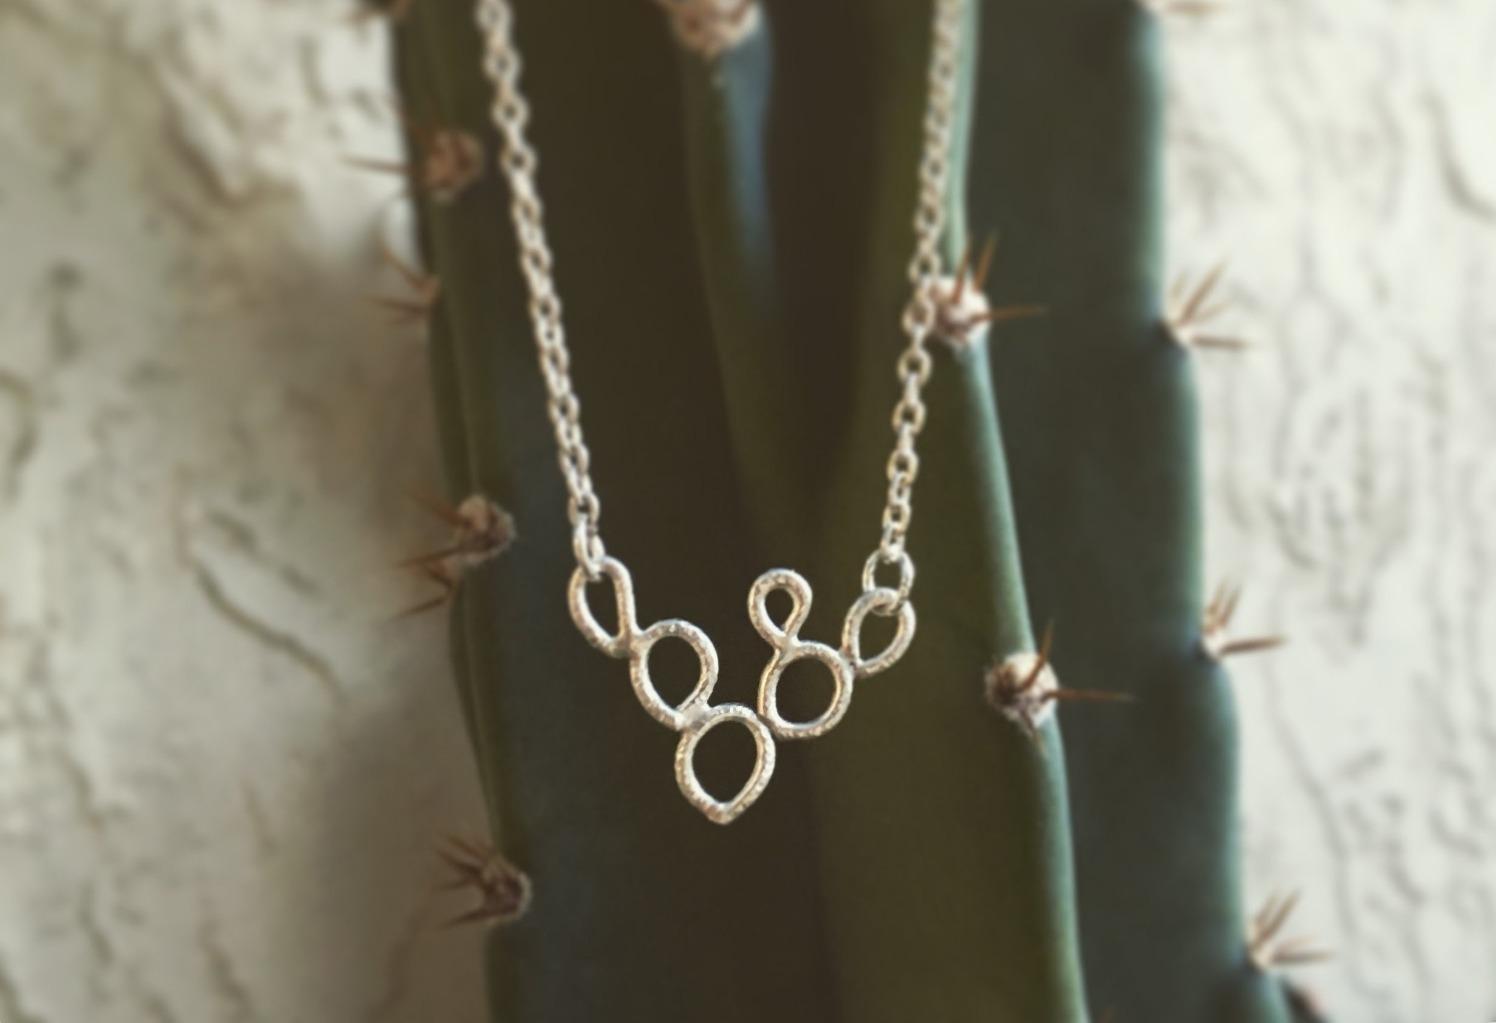 Prickly Pear necklace